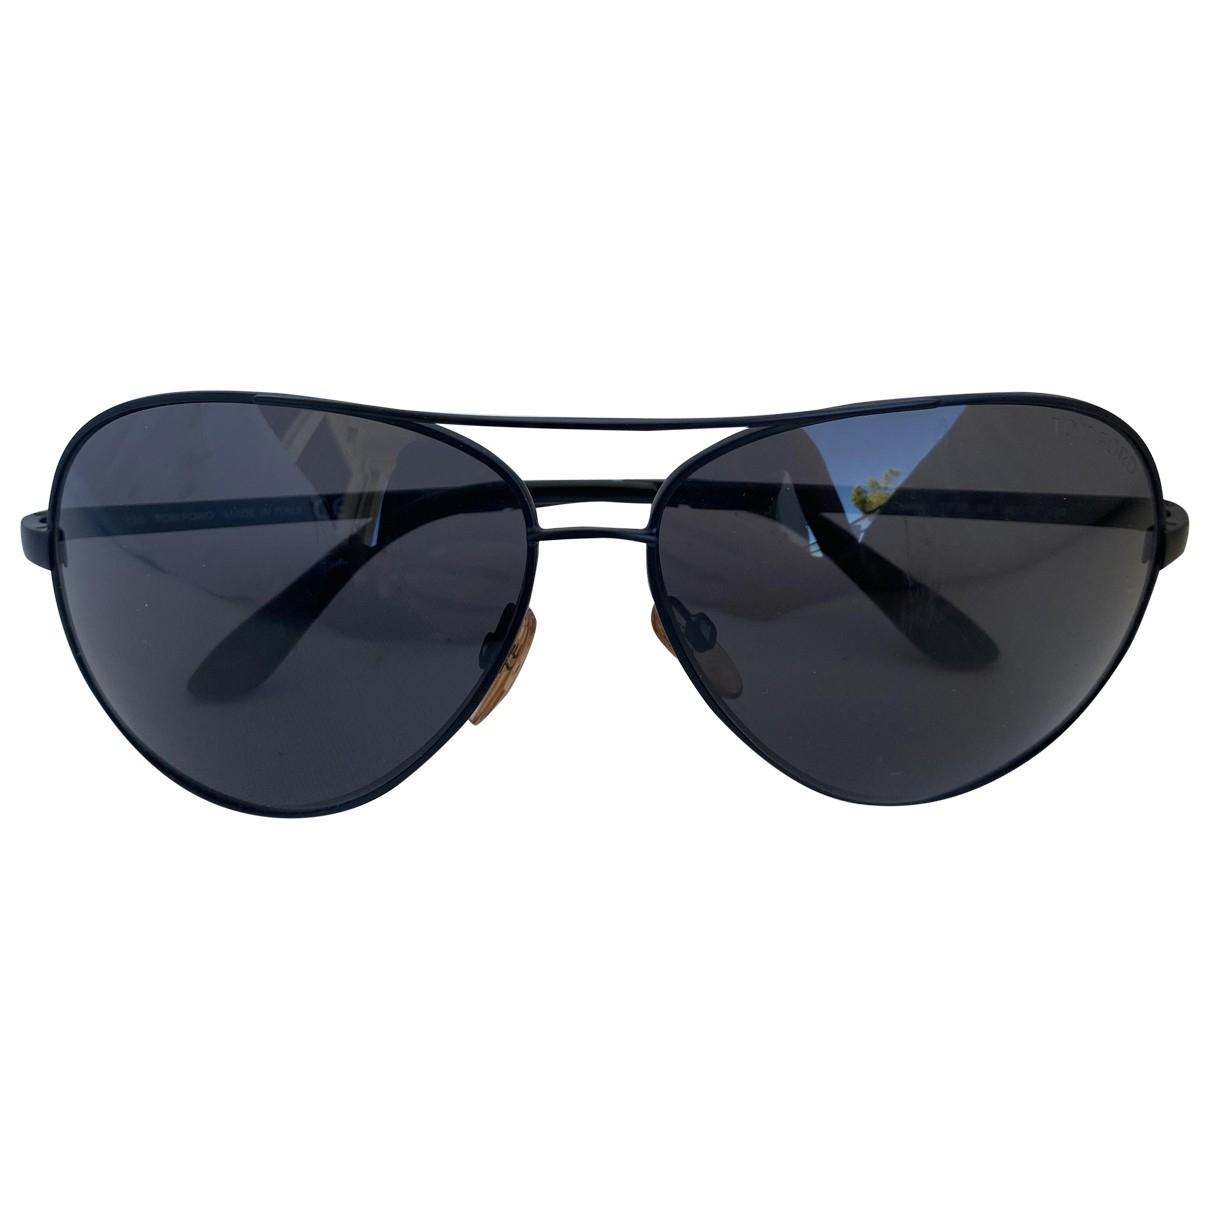 Tom Ford \N Black Metal Sunglasses for Women \N